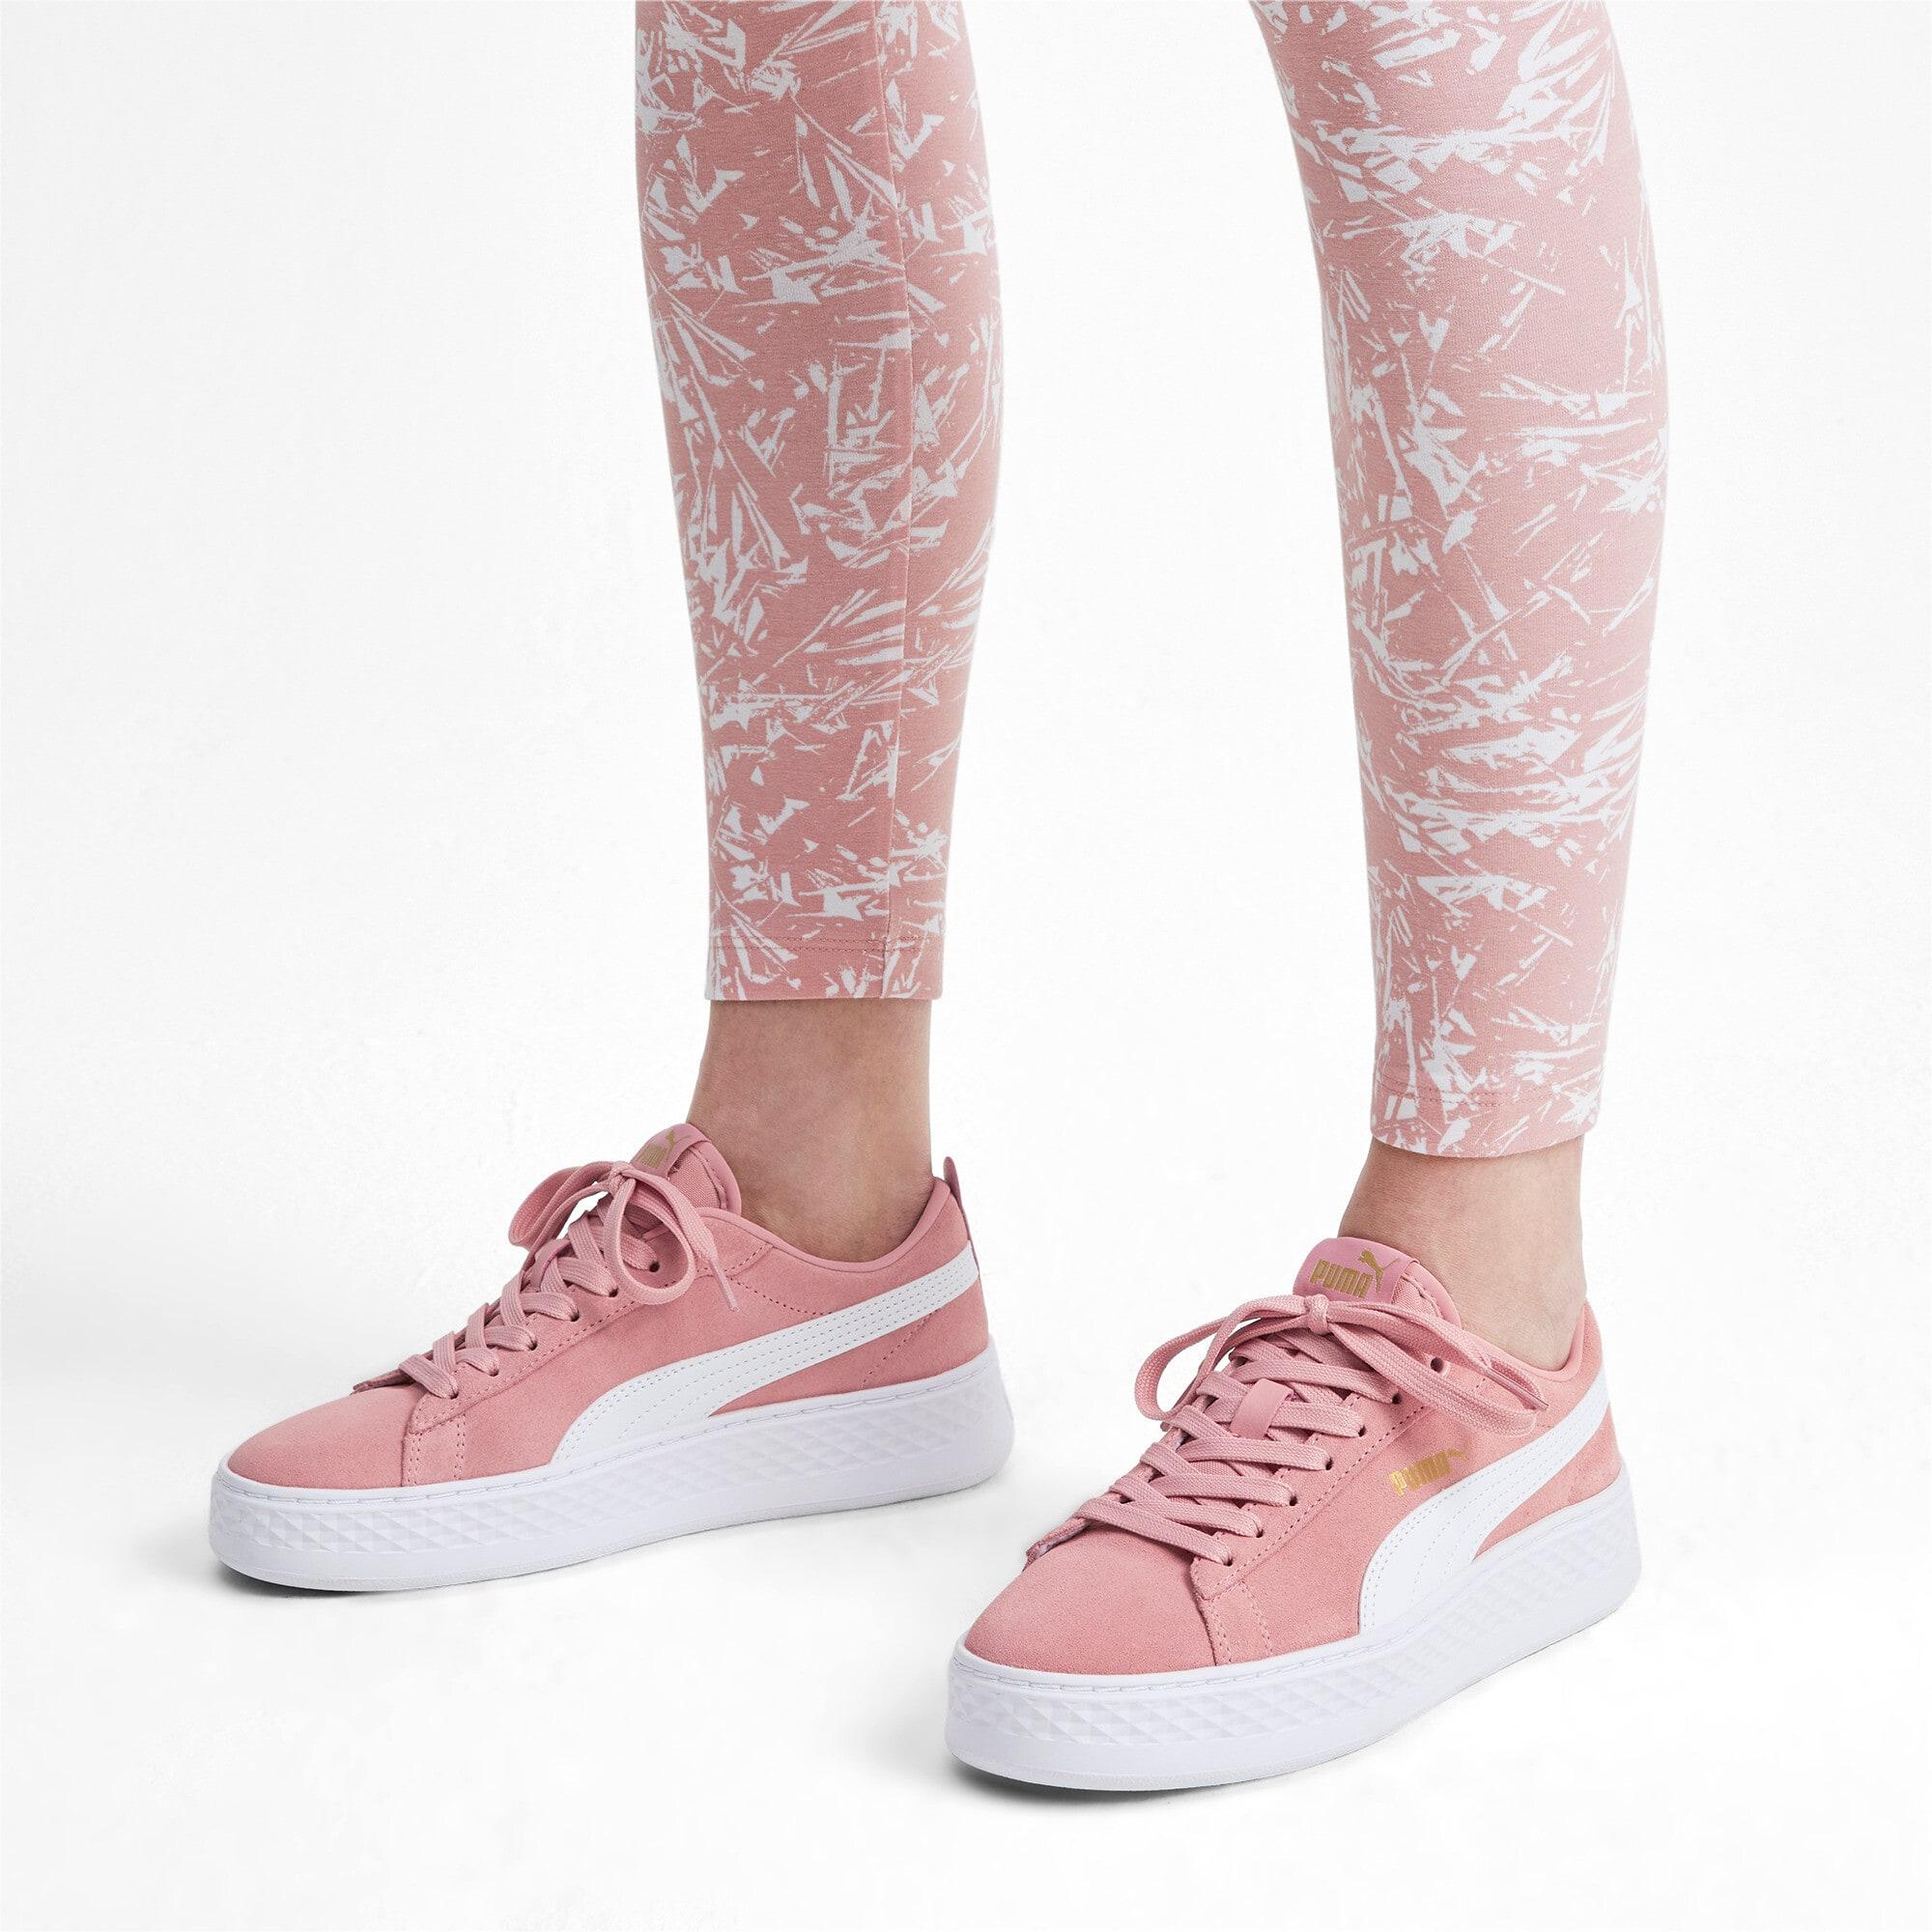 Thumbnail 2 of PUMA Smash Platform Suede Women's Sneakers, Bridal Rose-Puma White-Gold, medium